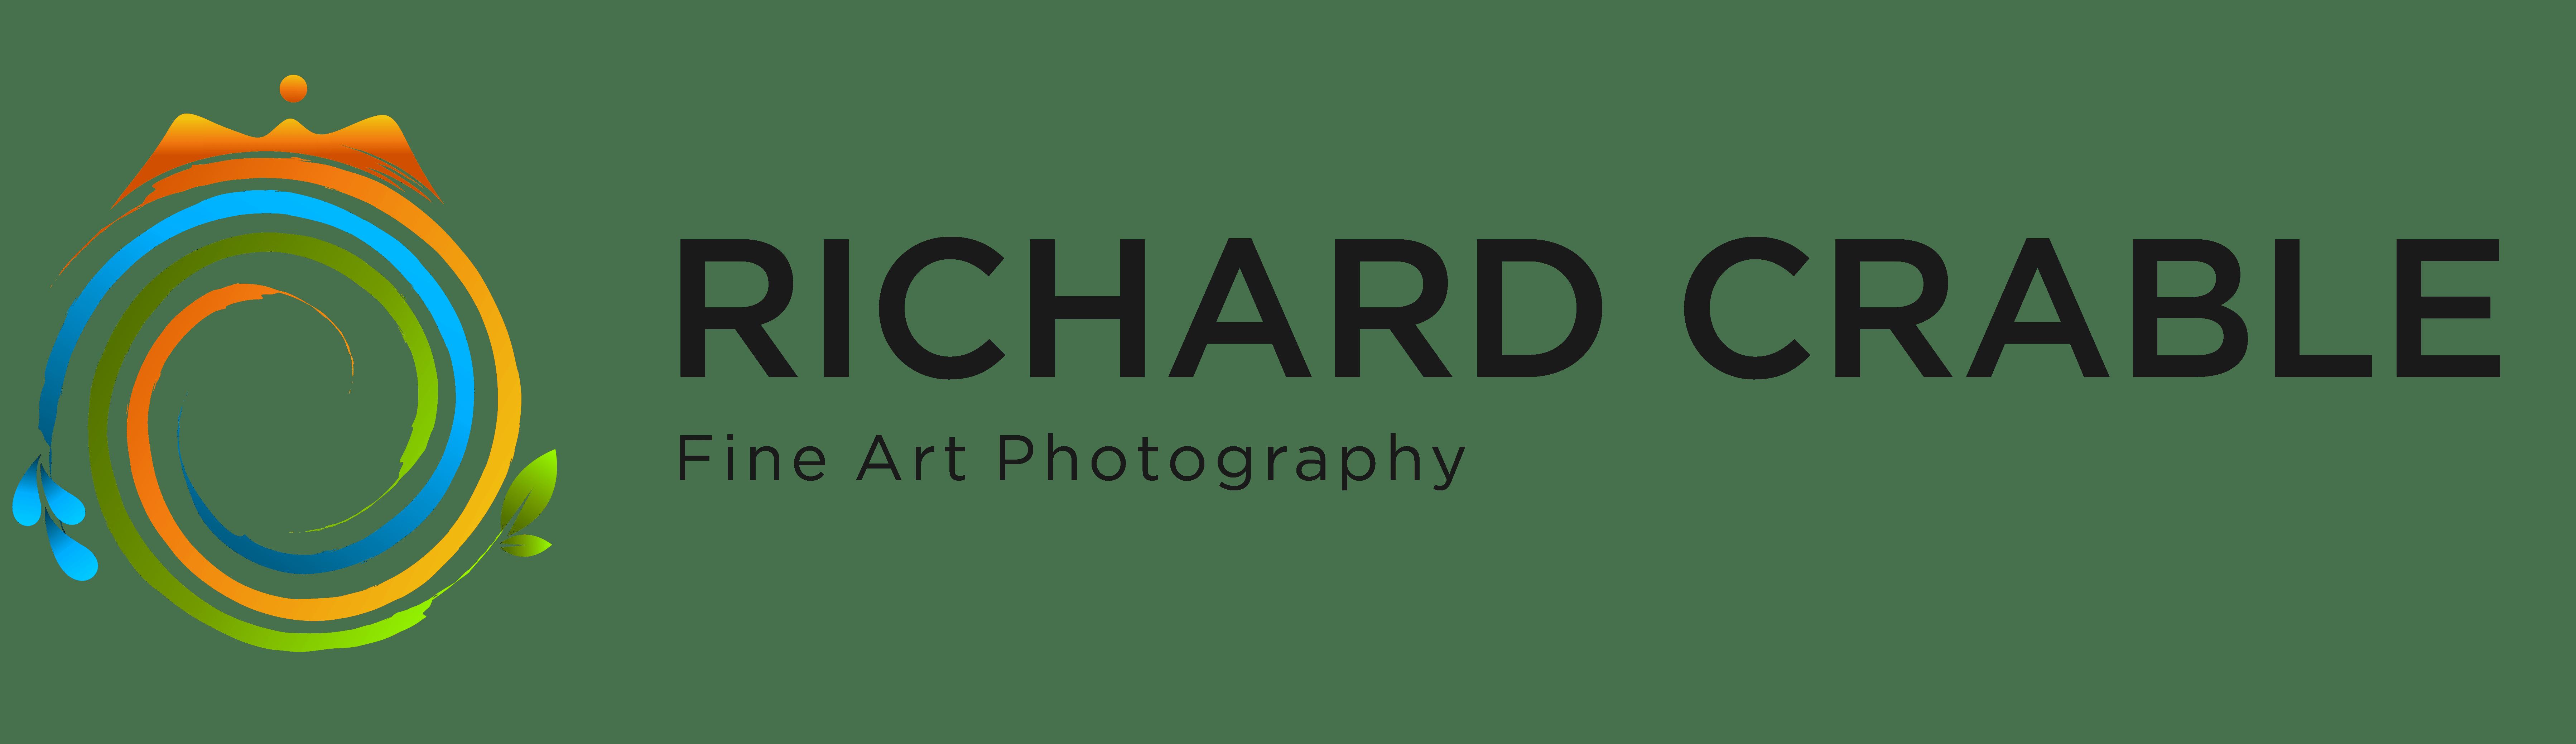 Richard Crable Fine Art Photography